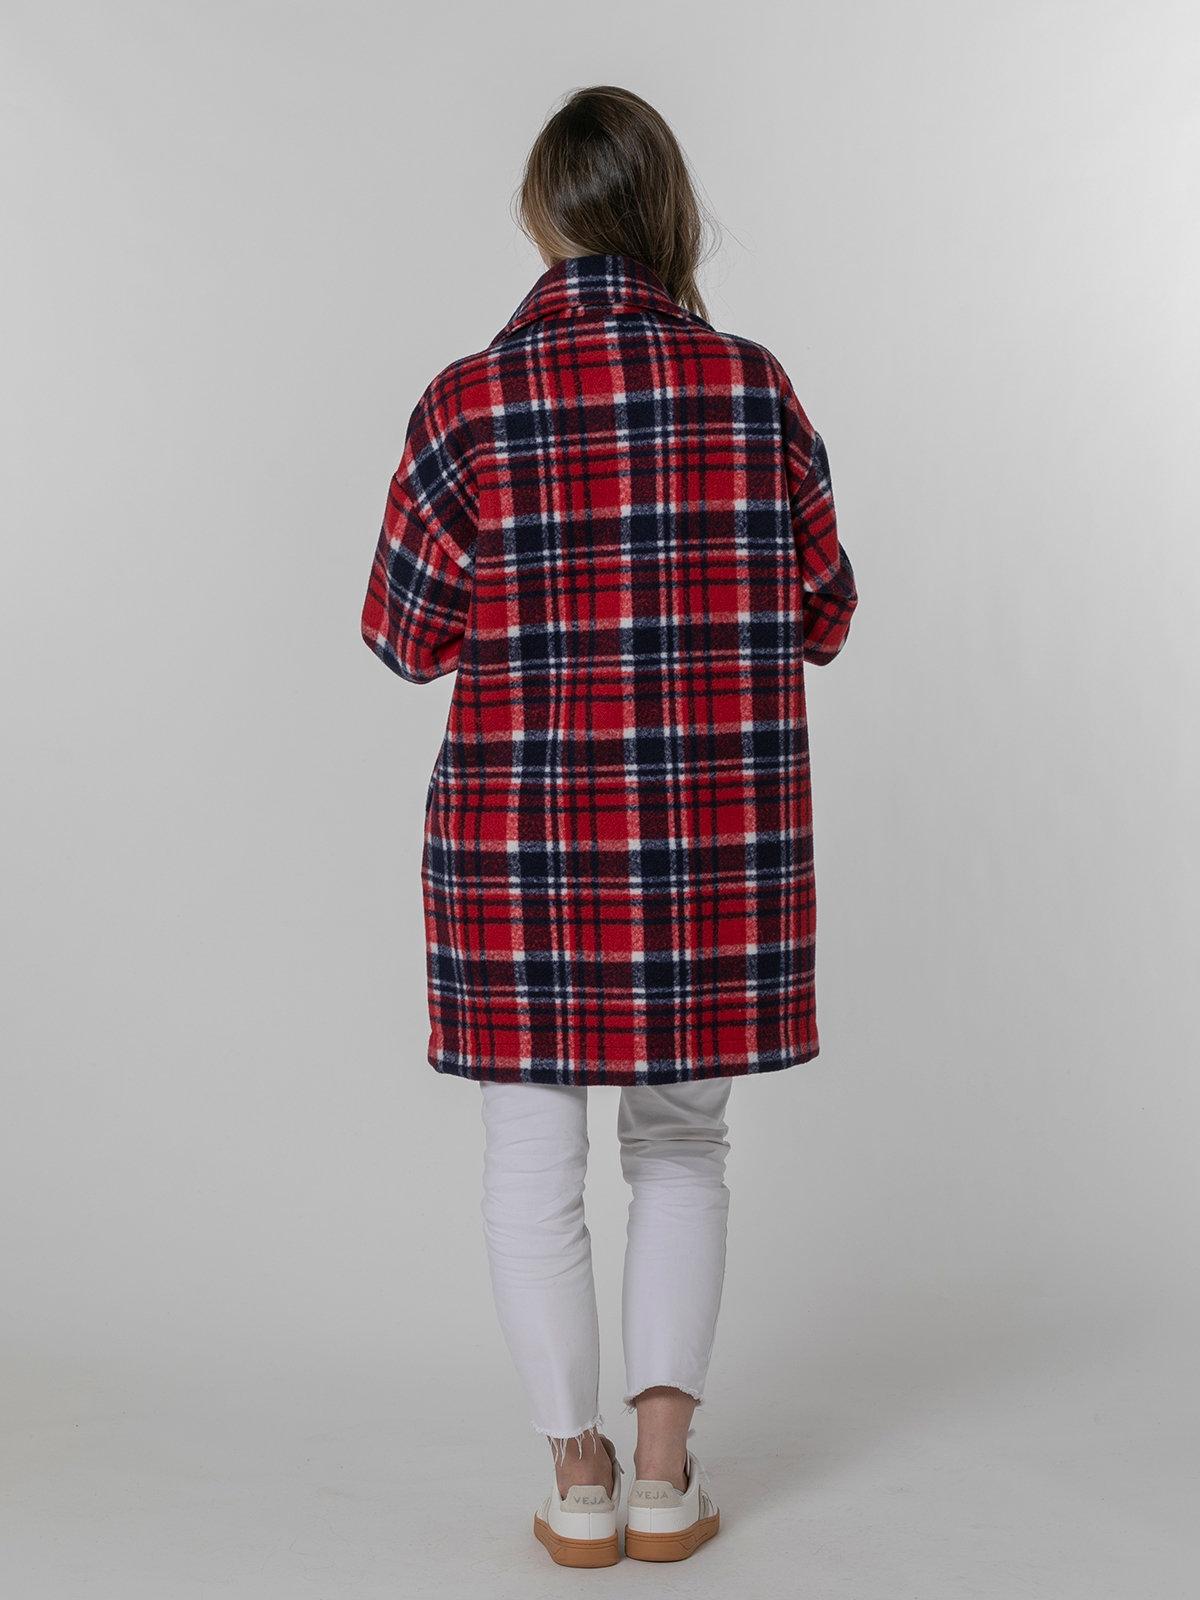 Abrigo mujer cuadro escoses bolsillo plastón Rojo